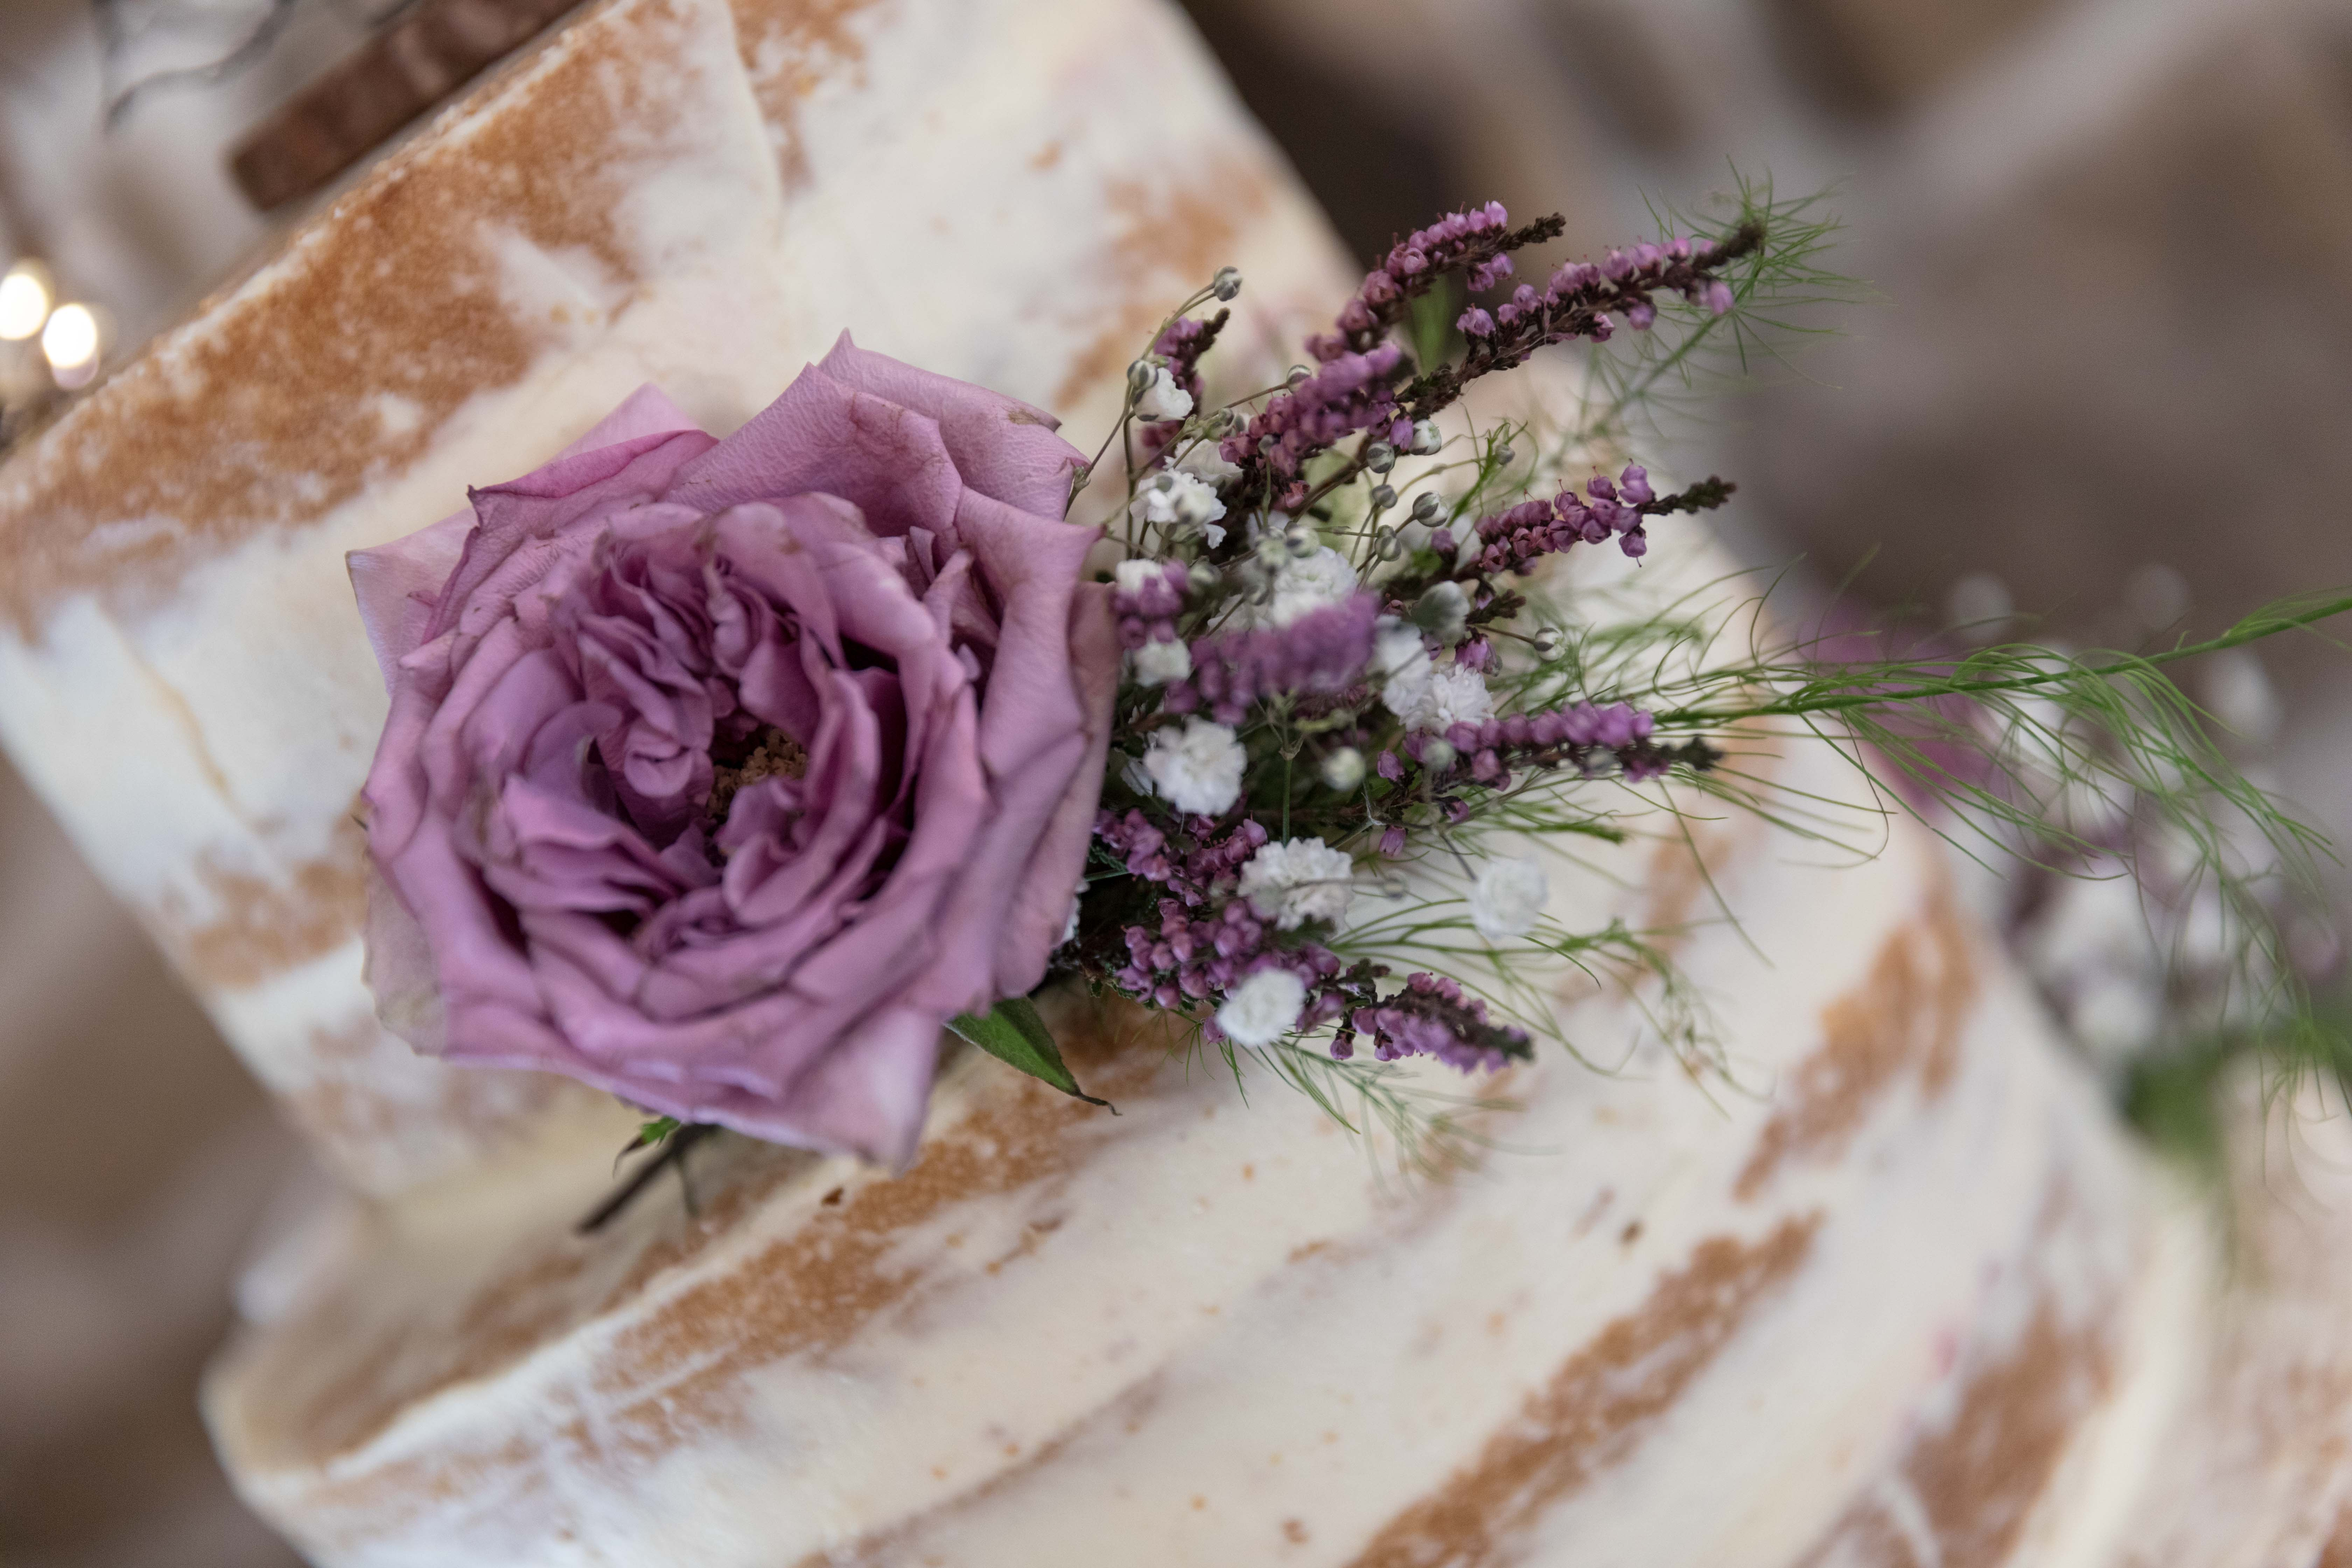 Wedding cake by wedding photographer